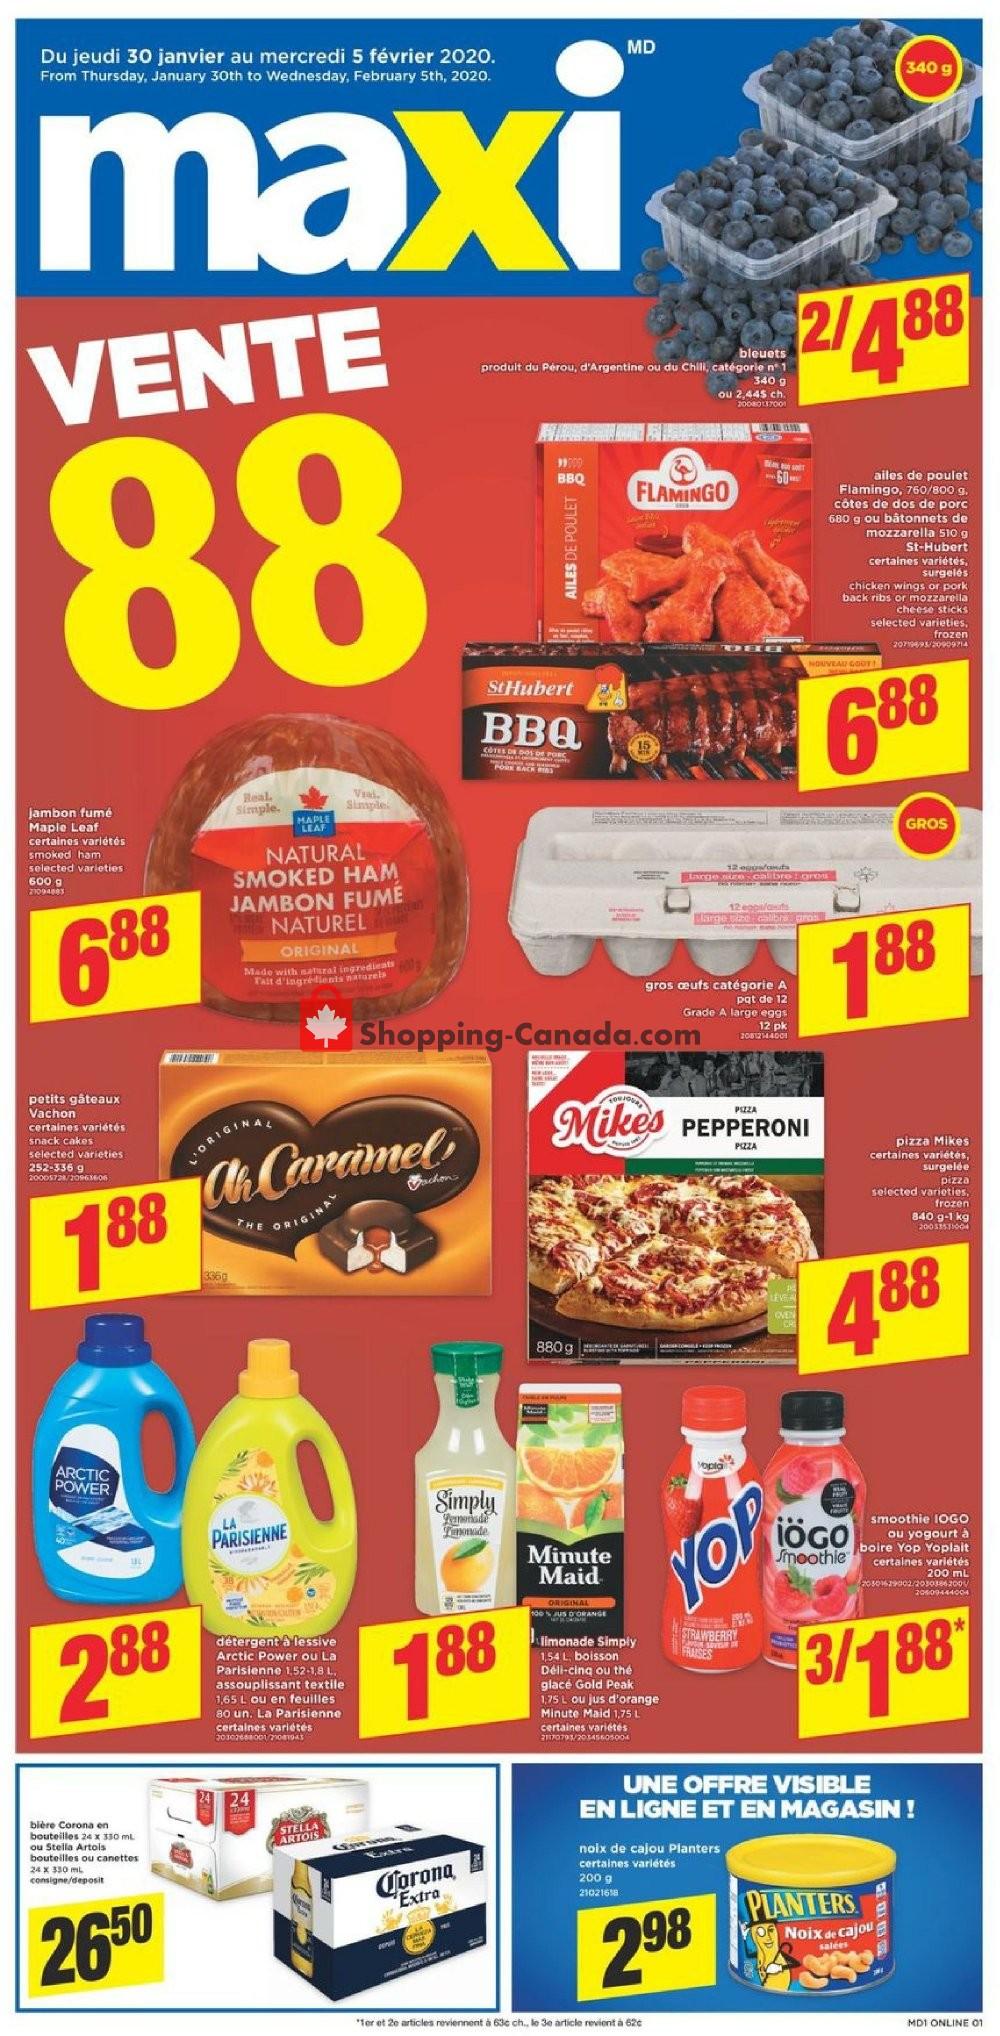 Flyer Maxi Canada - from Thursday January 30, 2020 to Wednesday February 5, 2020